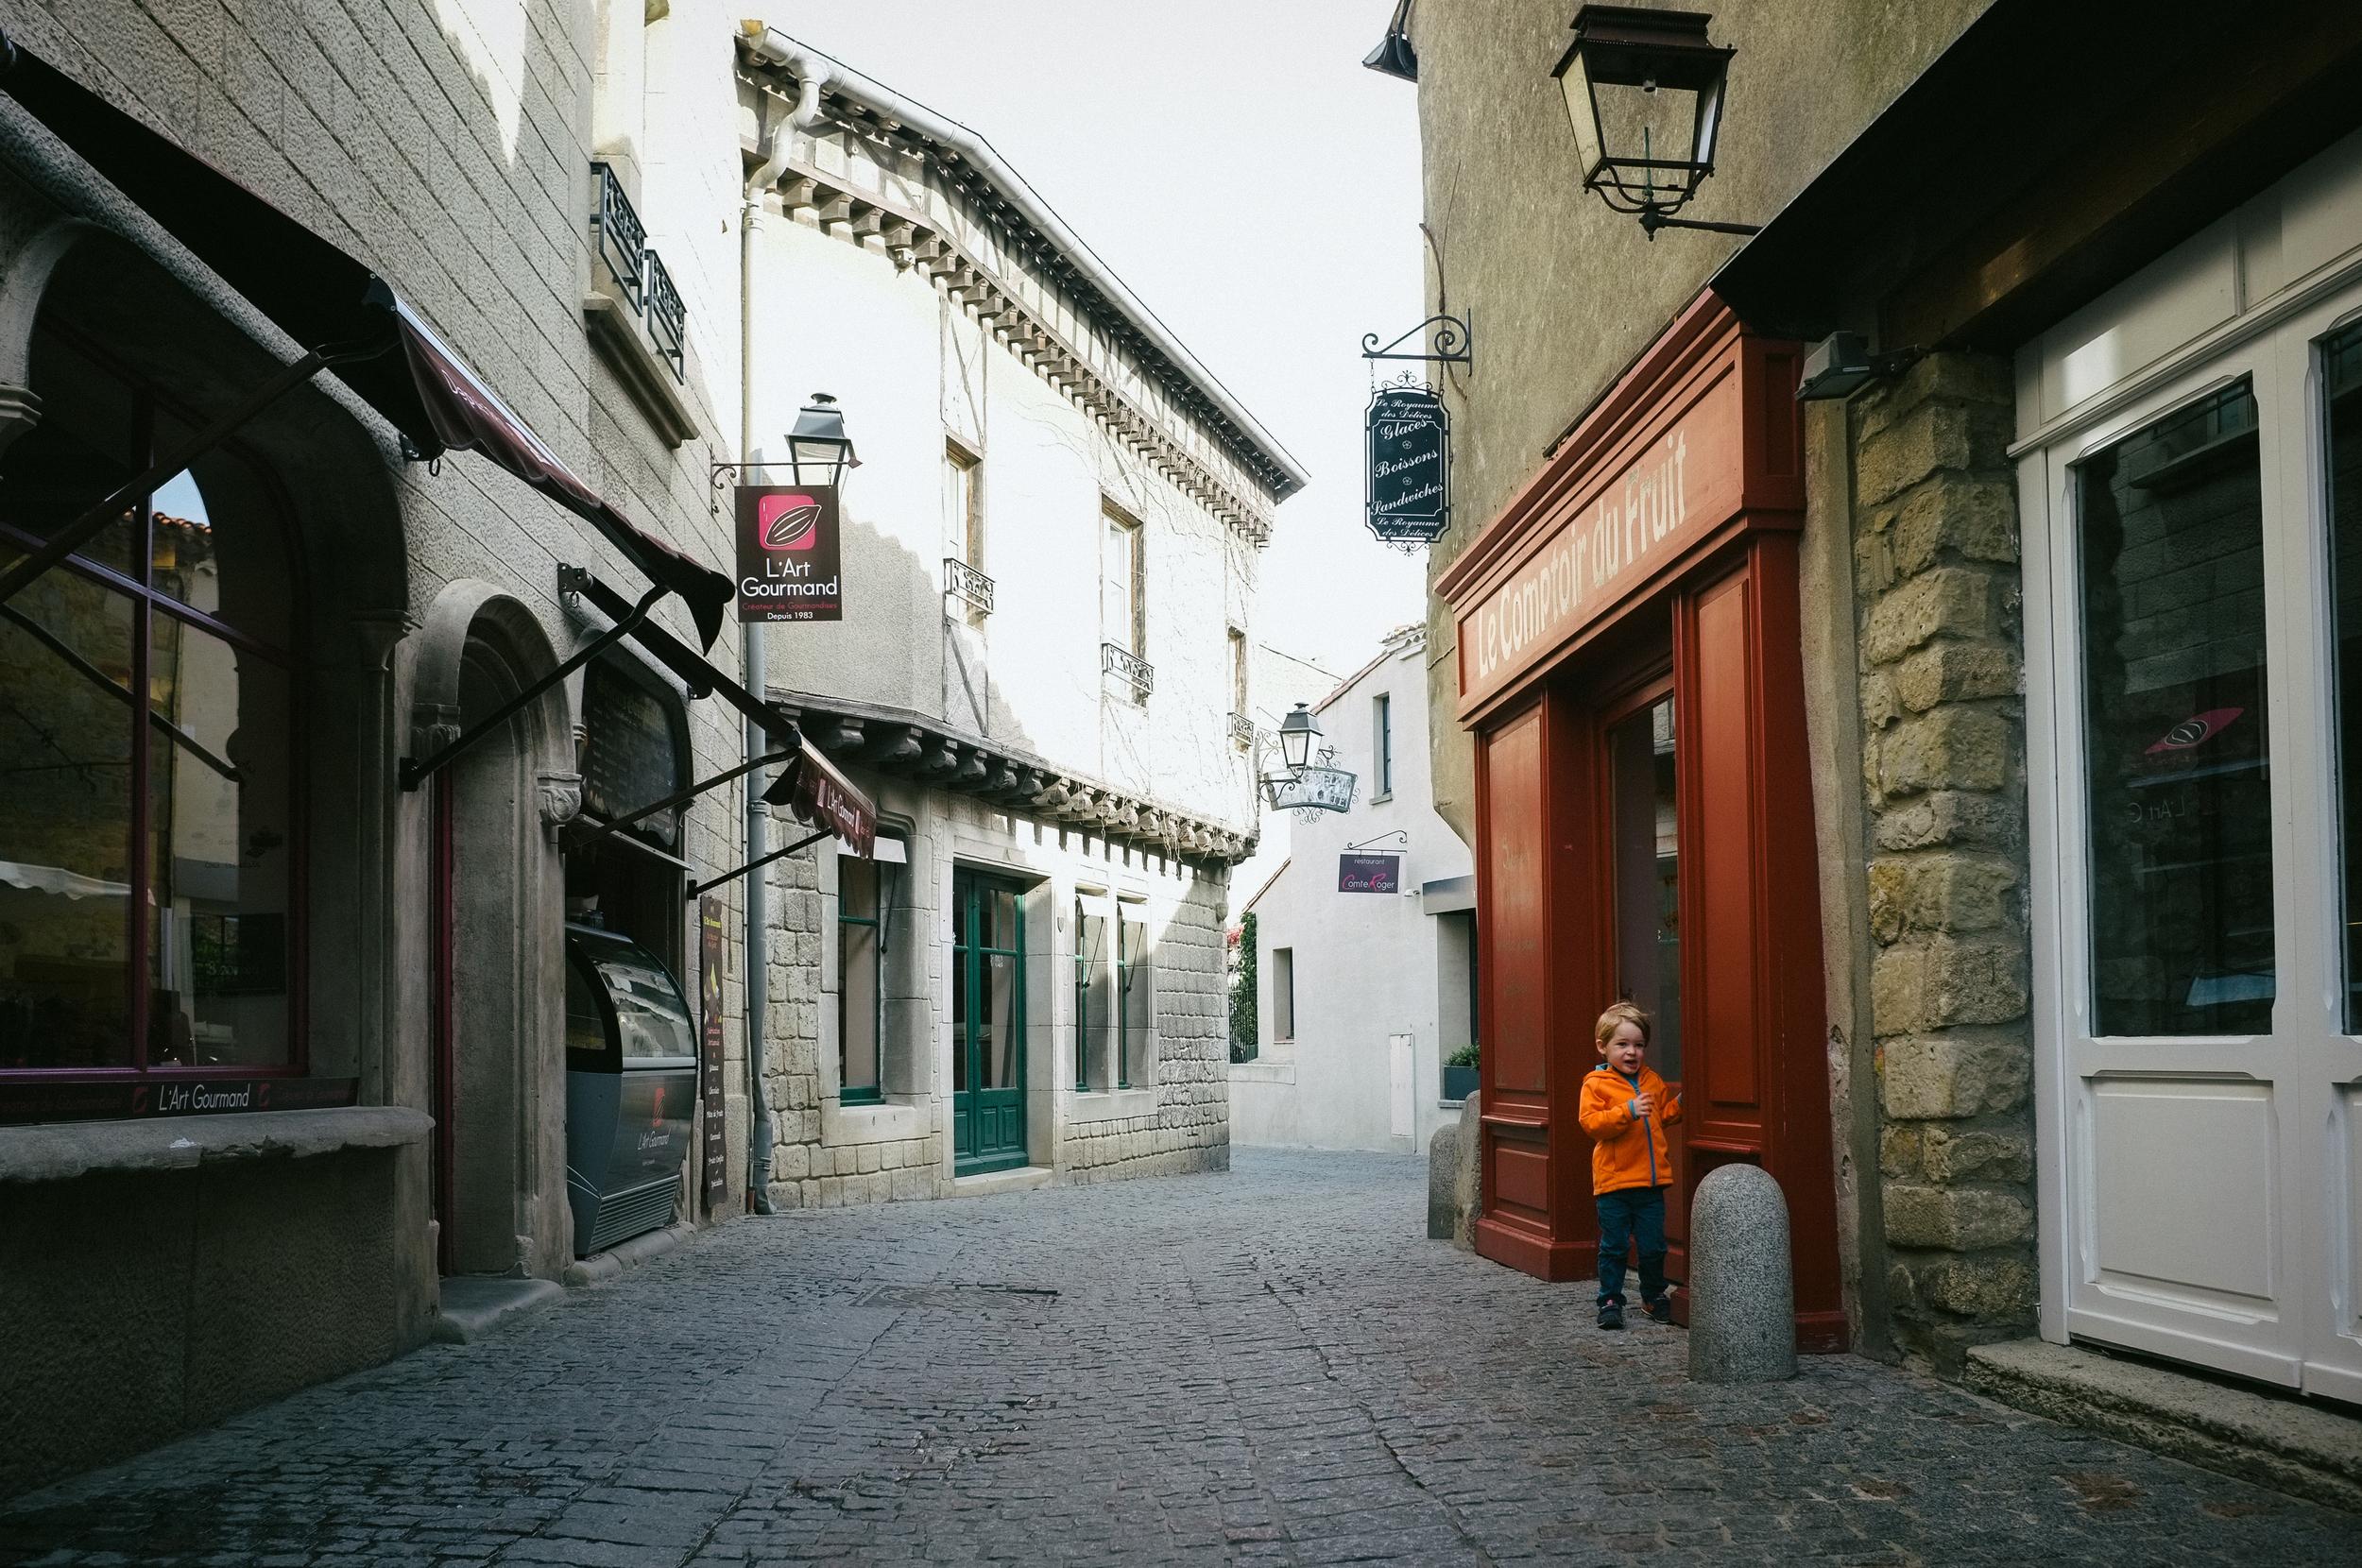 Boy in orange. Carcassonne